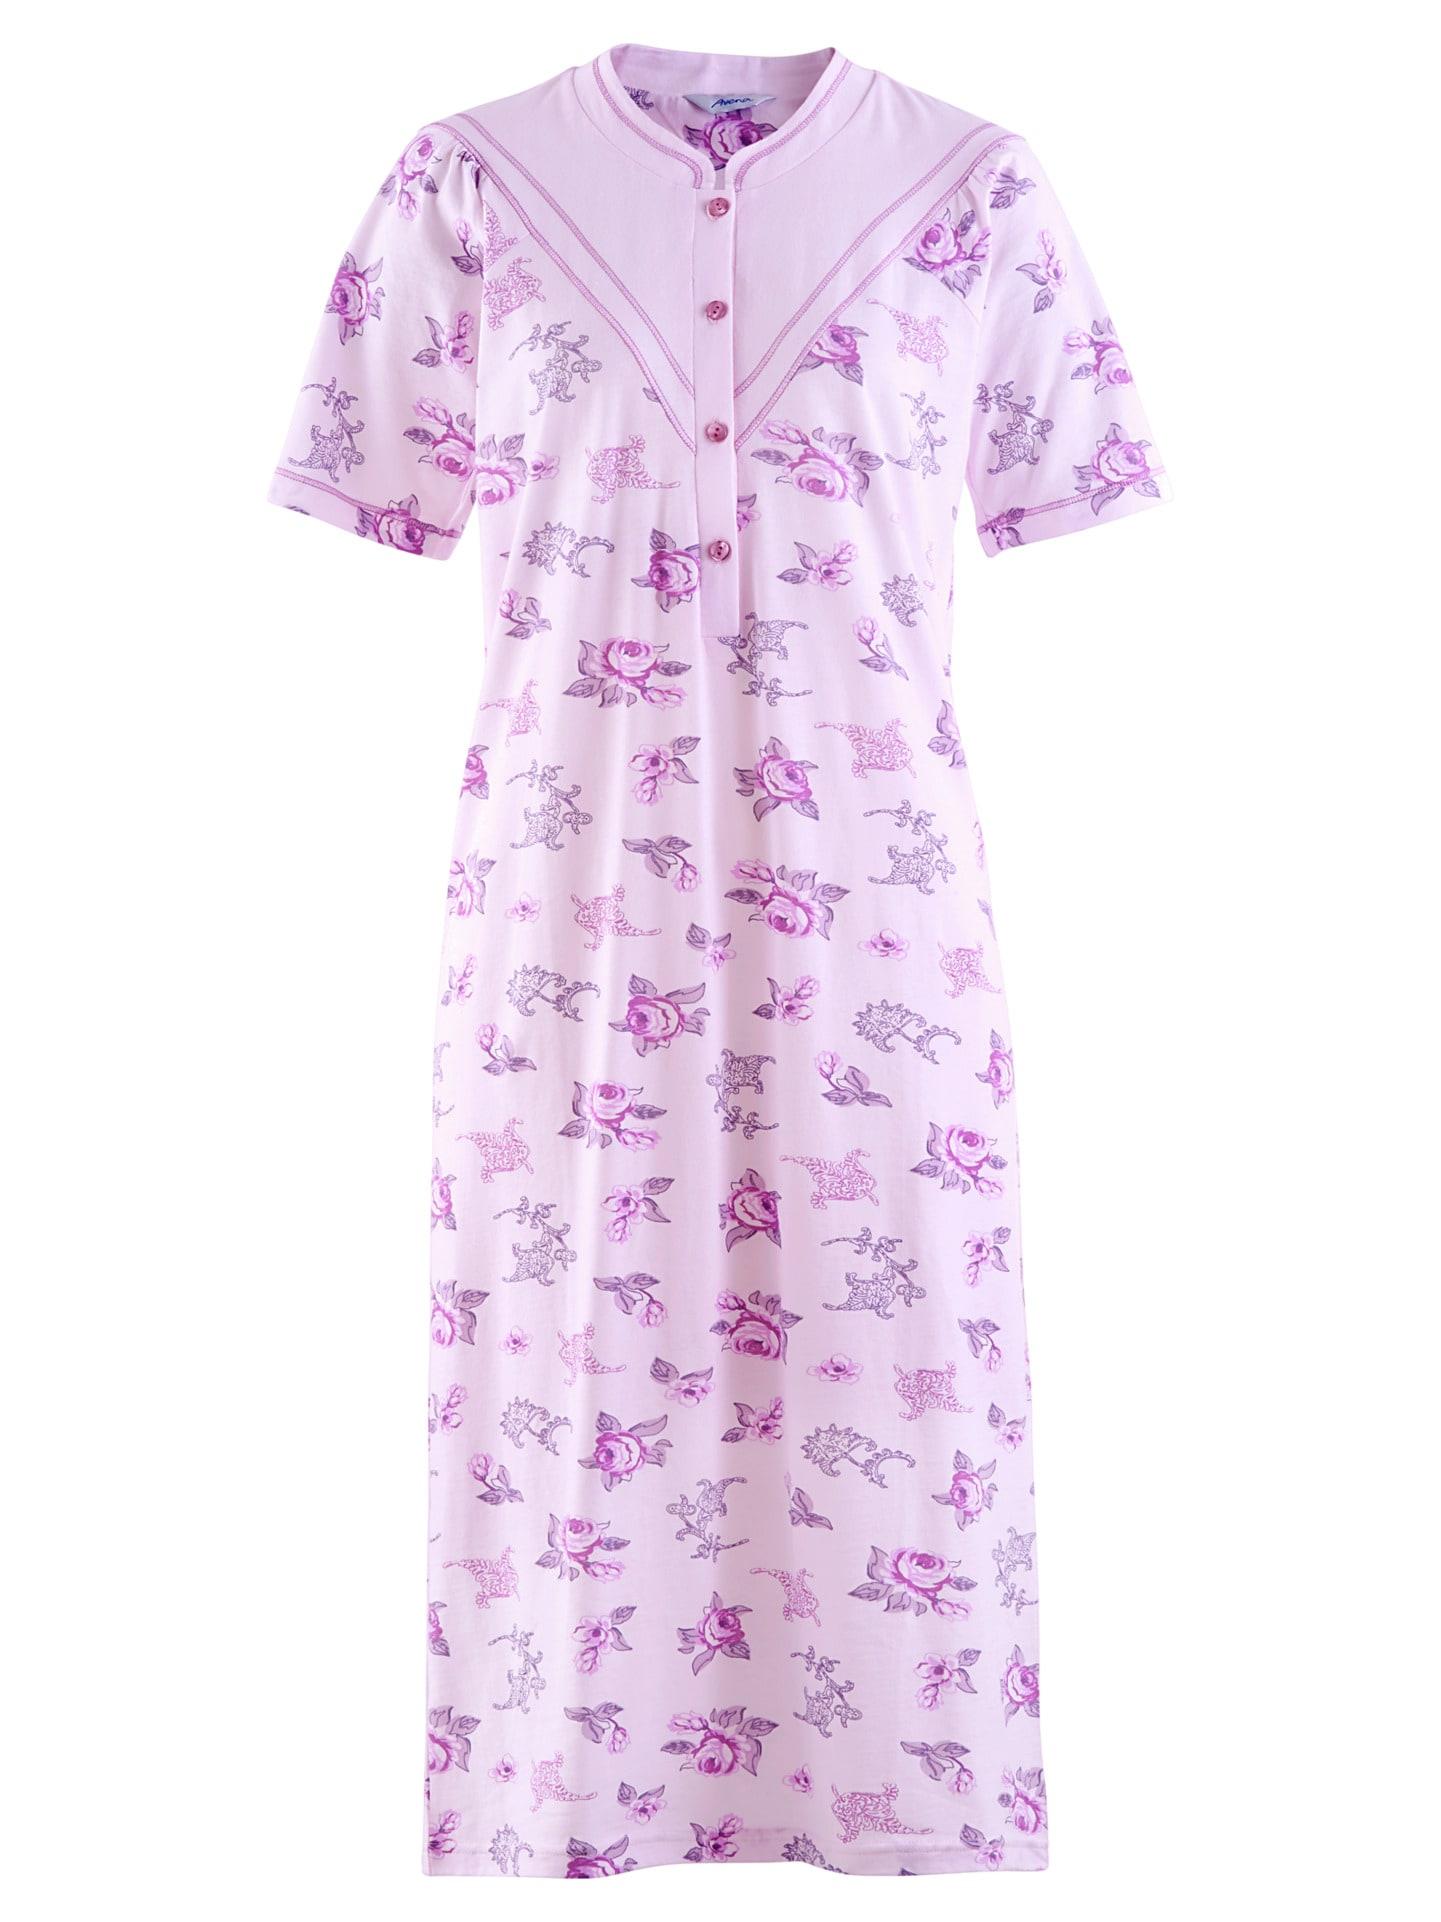 Avena Damen Baumwoll-Nachthemd Blütendessin Rose 42-6359-9